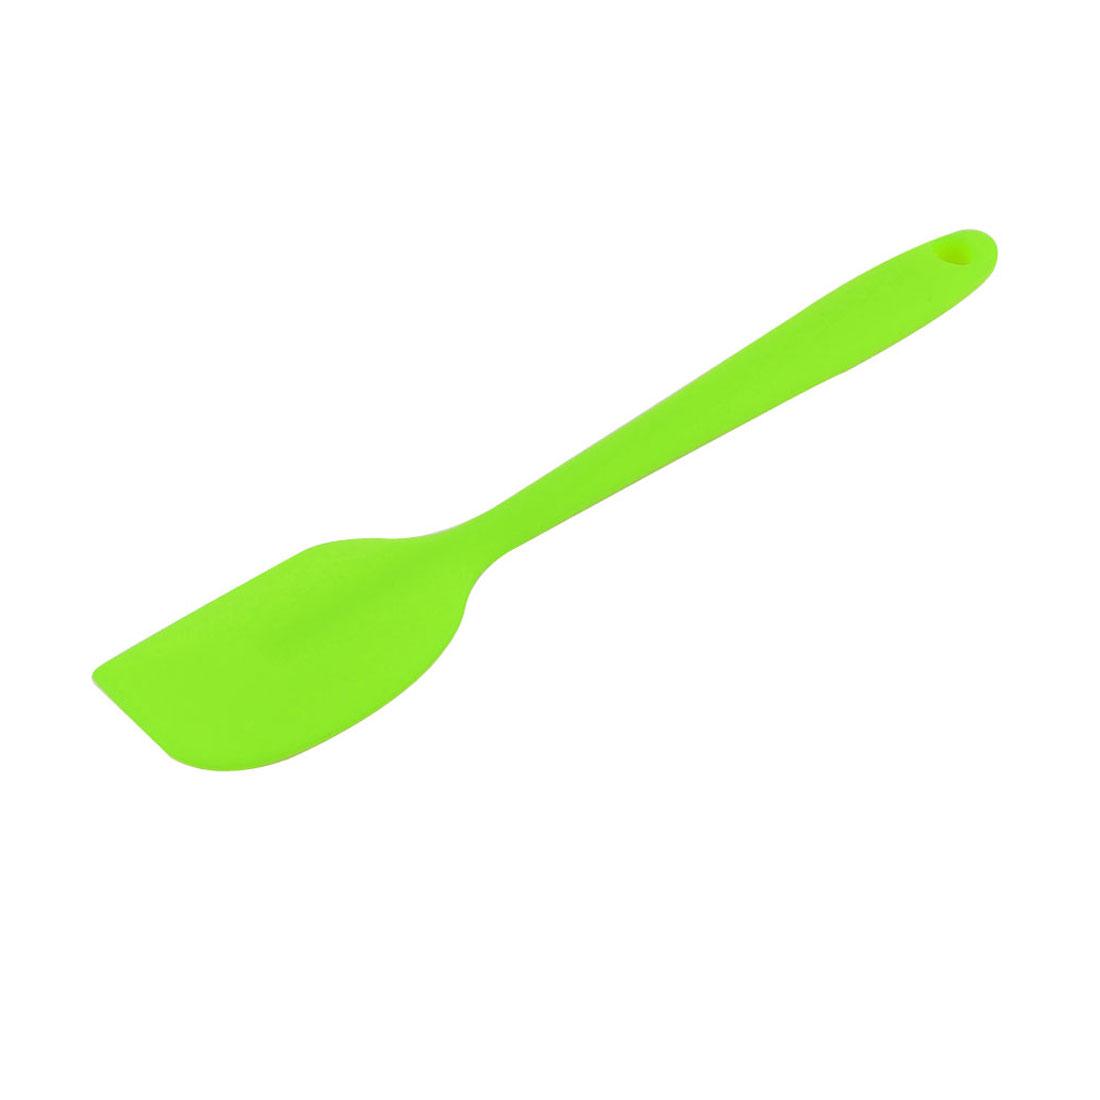 Silicone Cake Cream Butter Mixing Stir Bakeware Tool Spatula Scraper Green